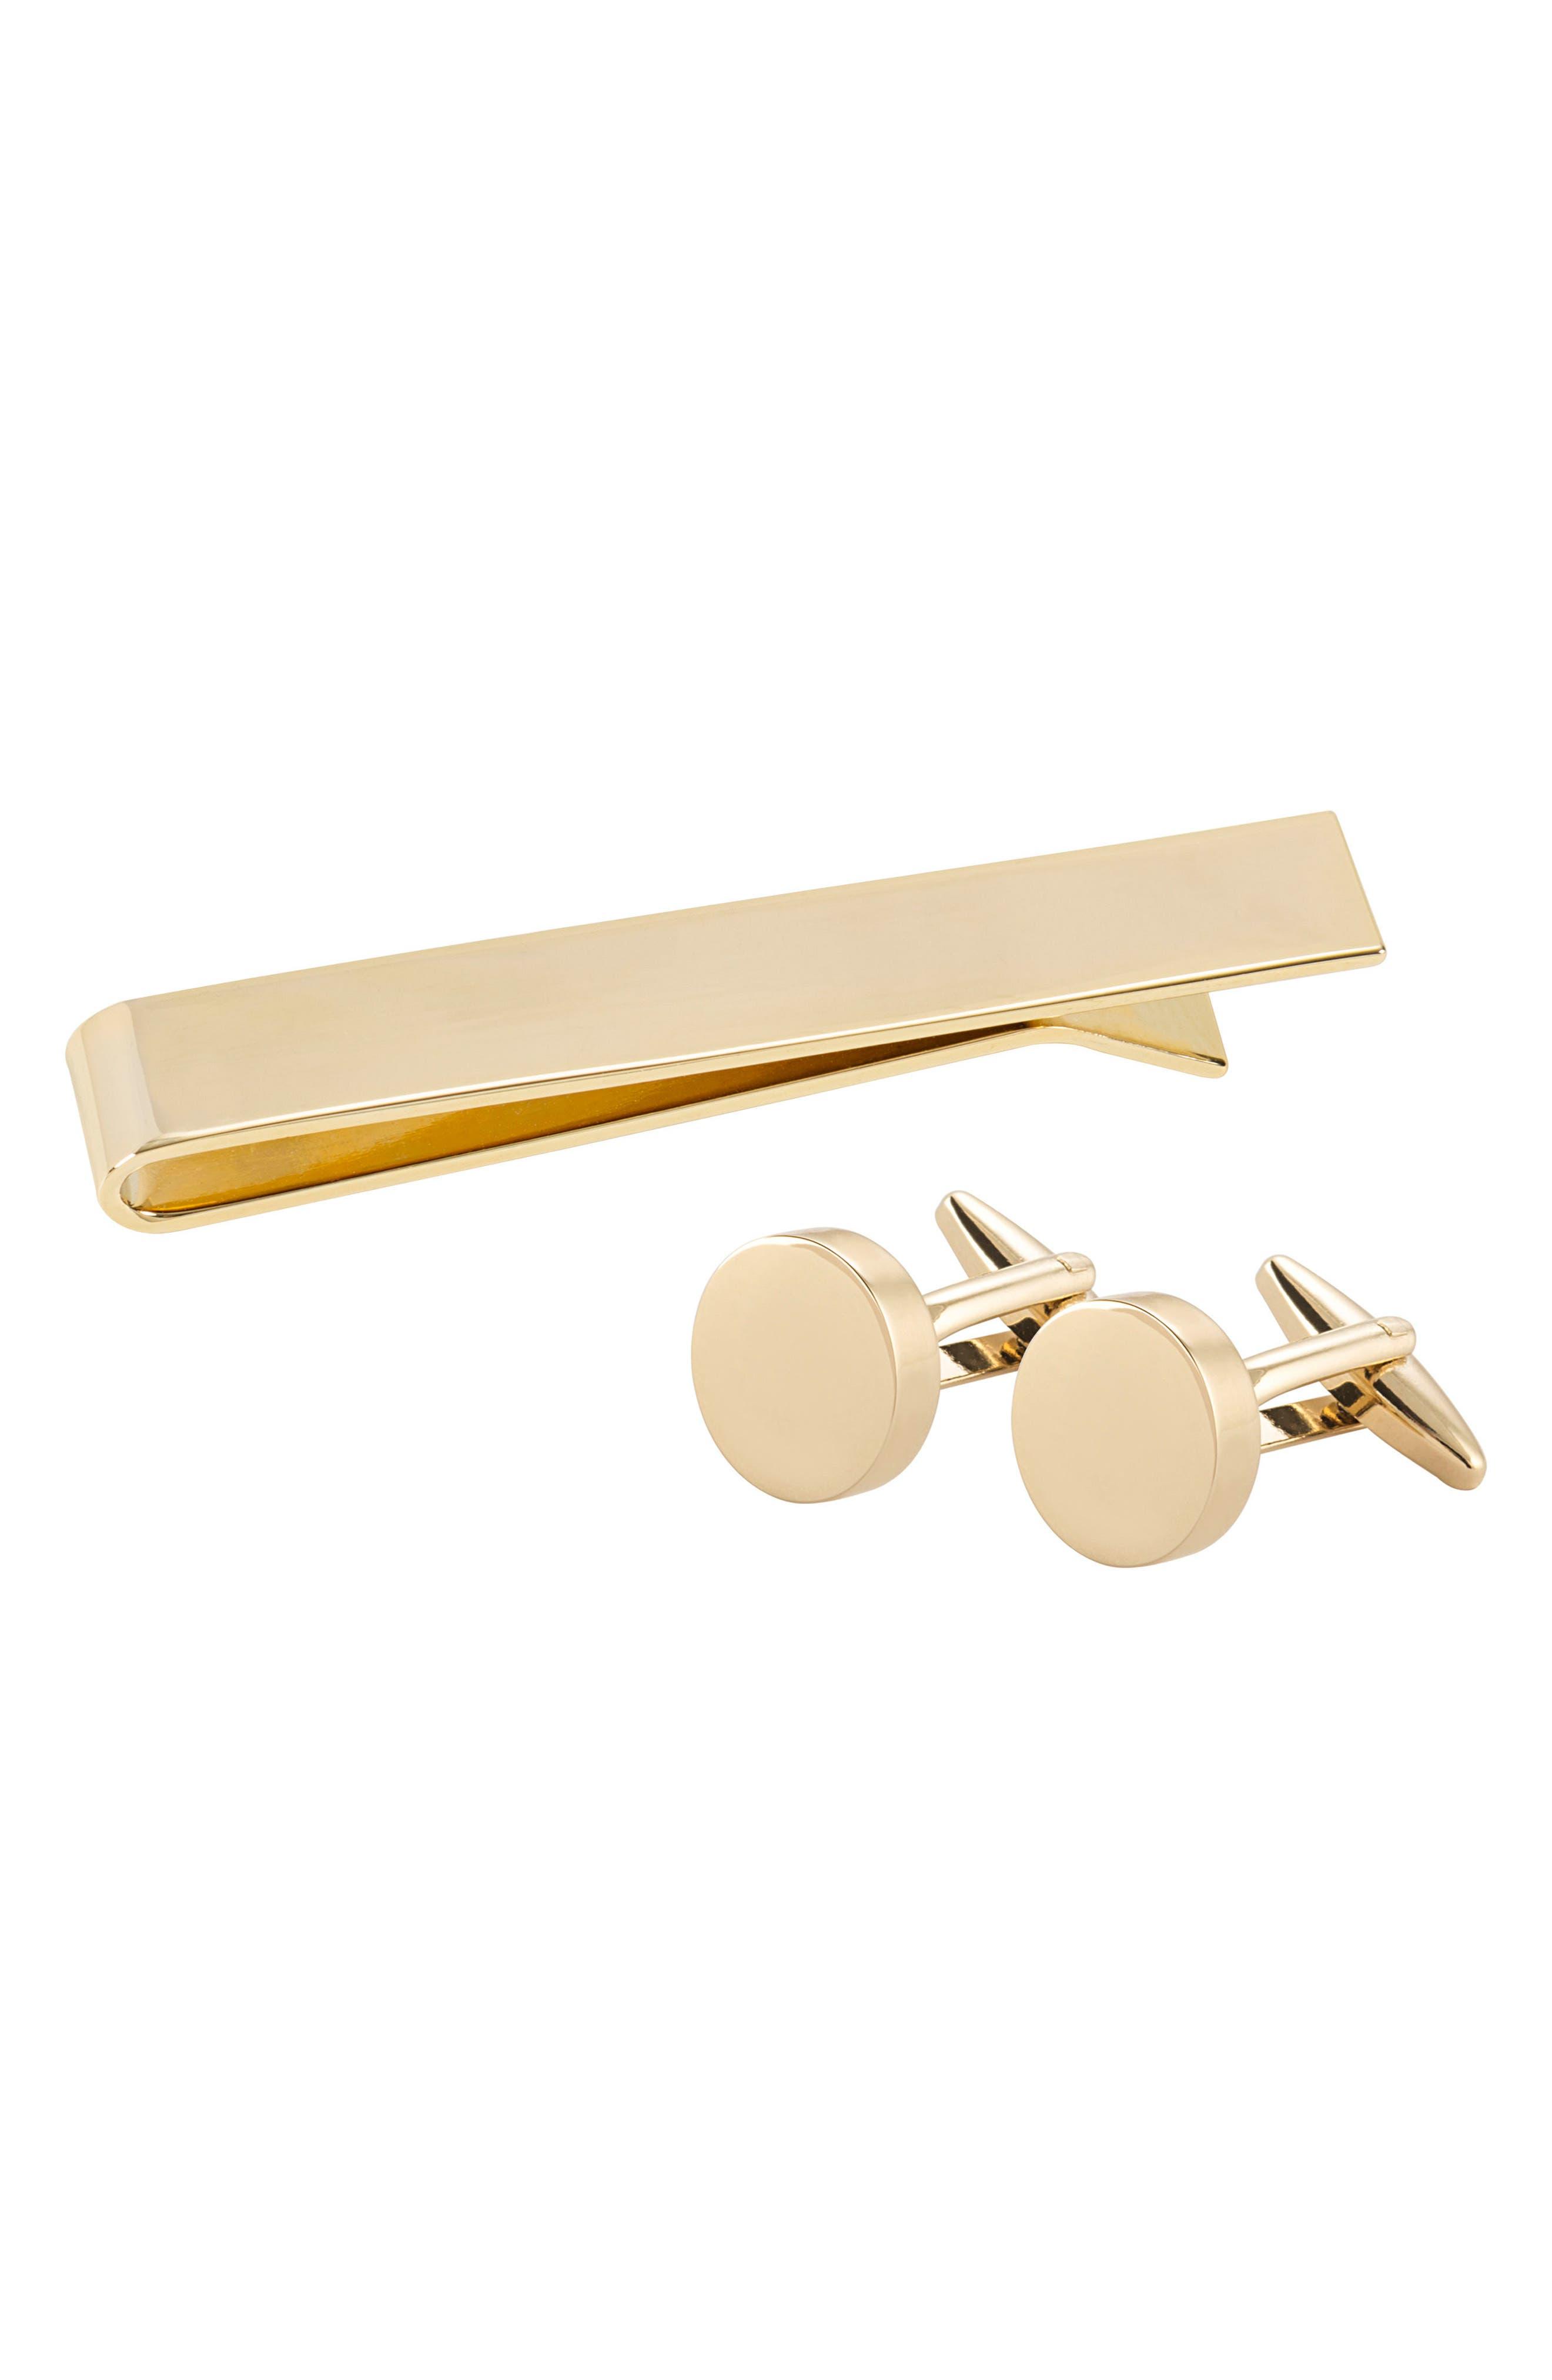 Monogram Cuff Links & Tie Bar Set,                         Main,                         color, Gold